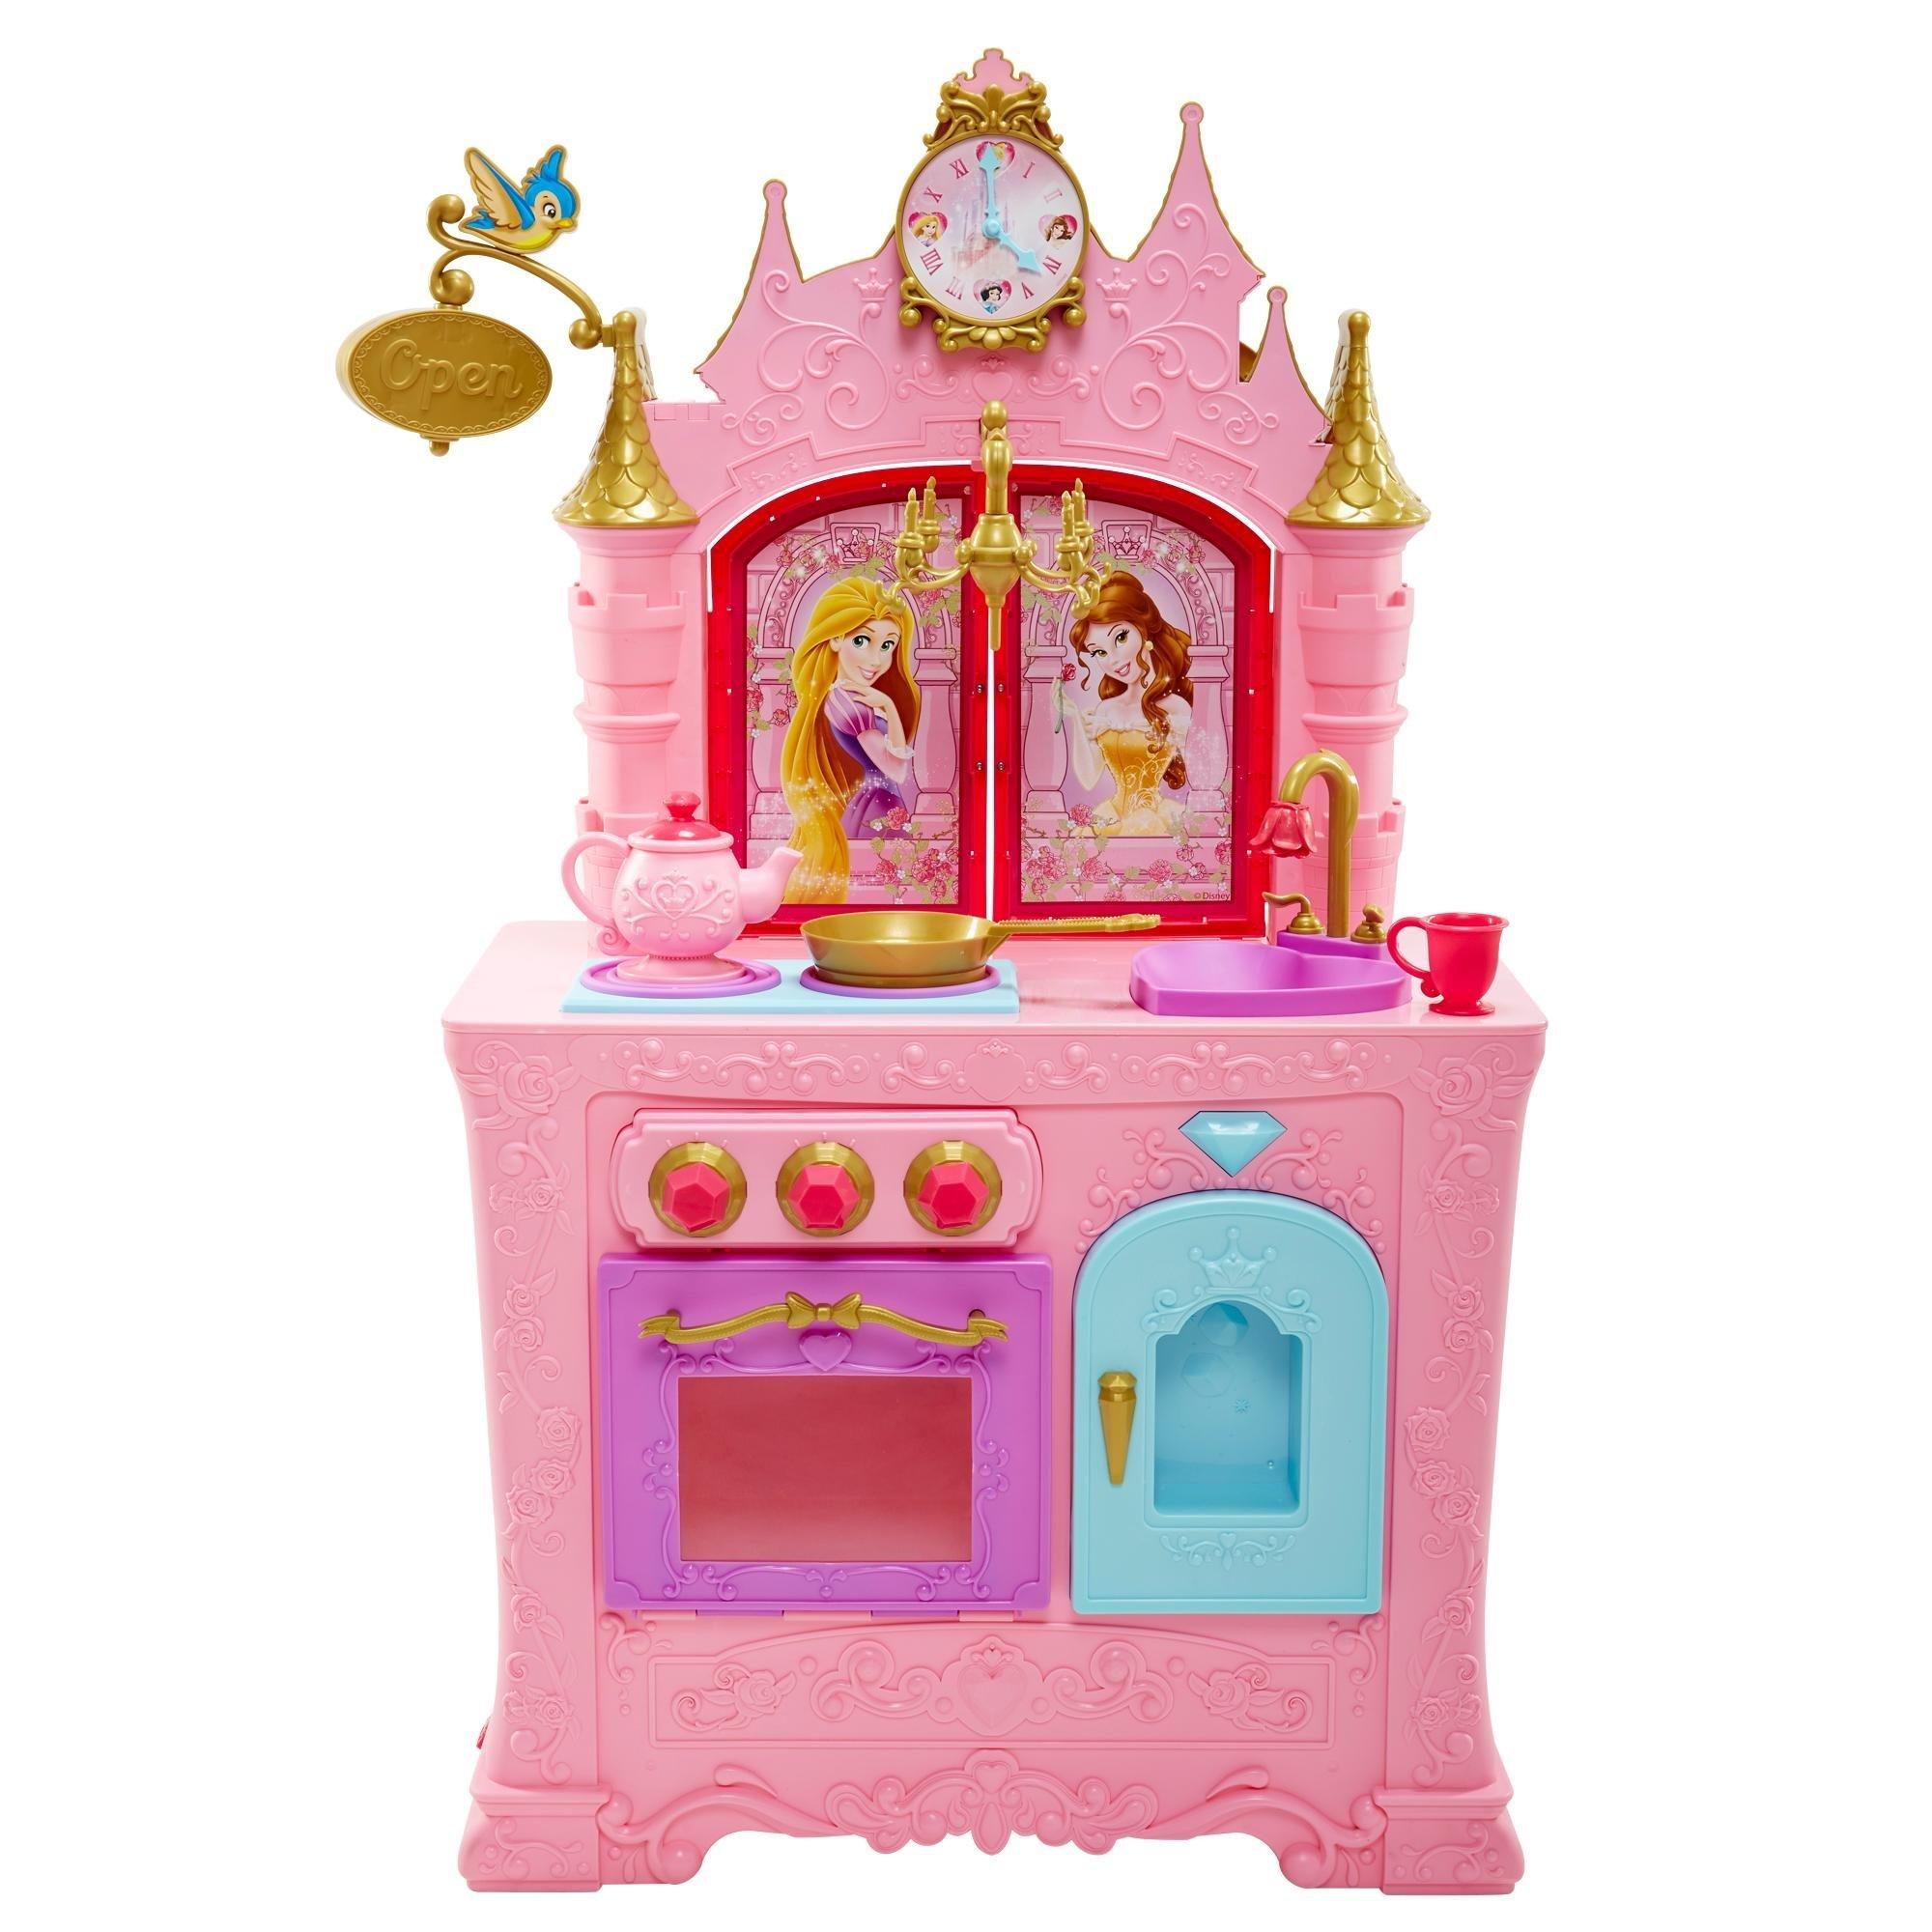 Kitchen Games: Amazon.com: Disney Princess Royal 2-Sided Kitchen & Caf